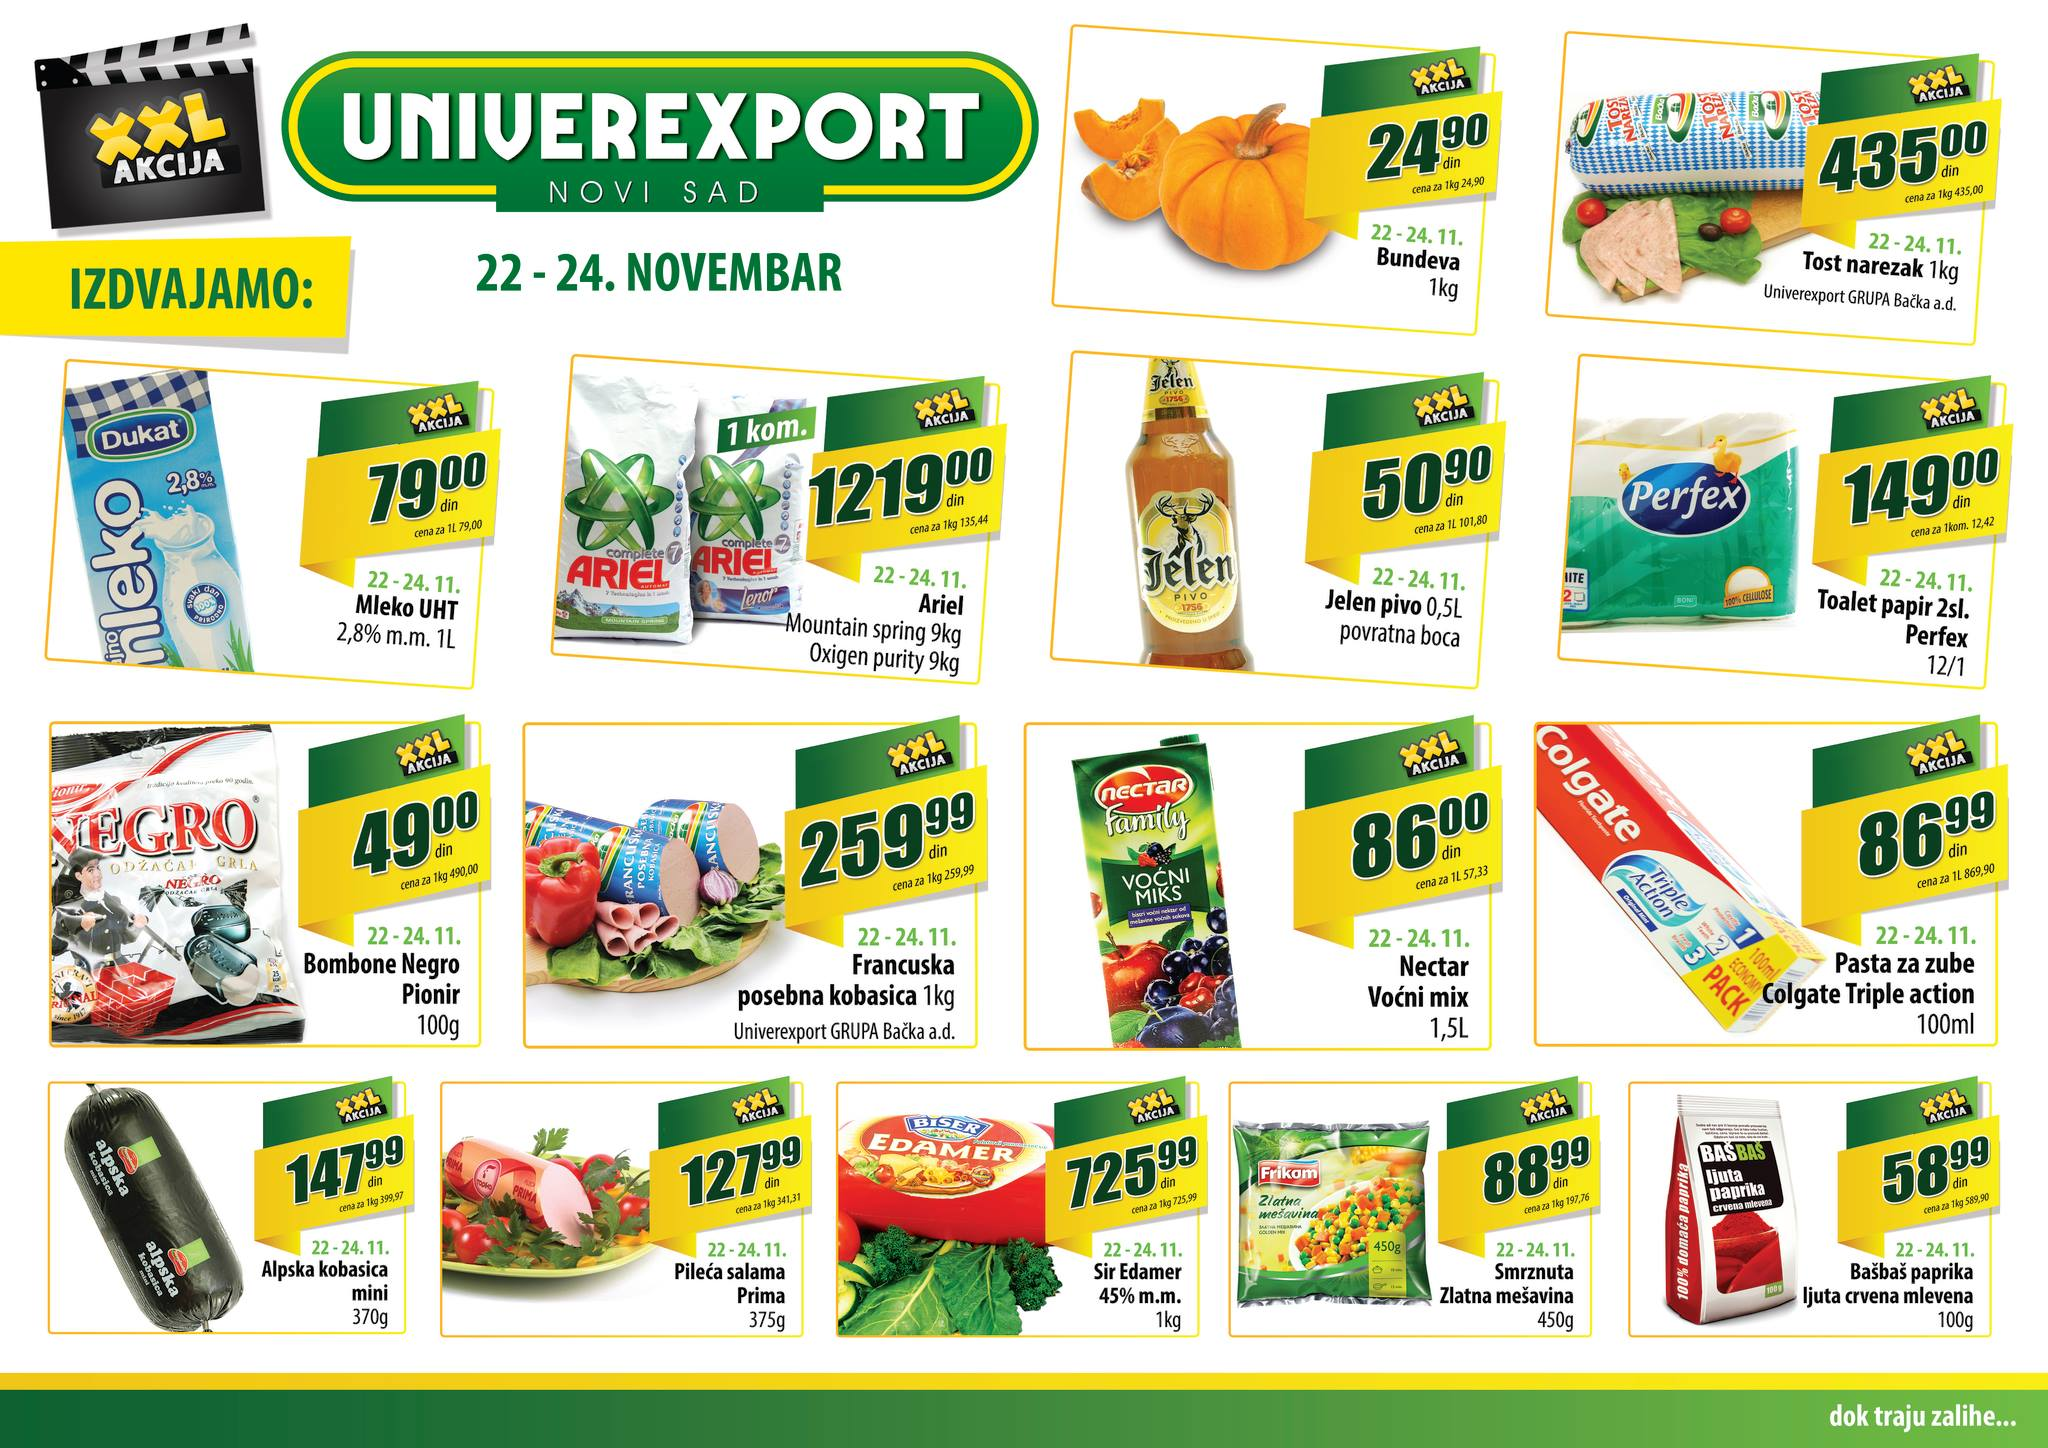 Univerexport katalog vikend dobre kupovine